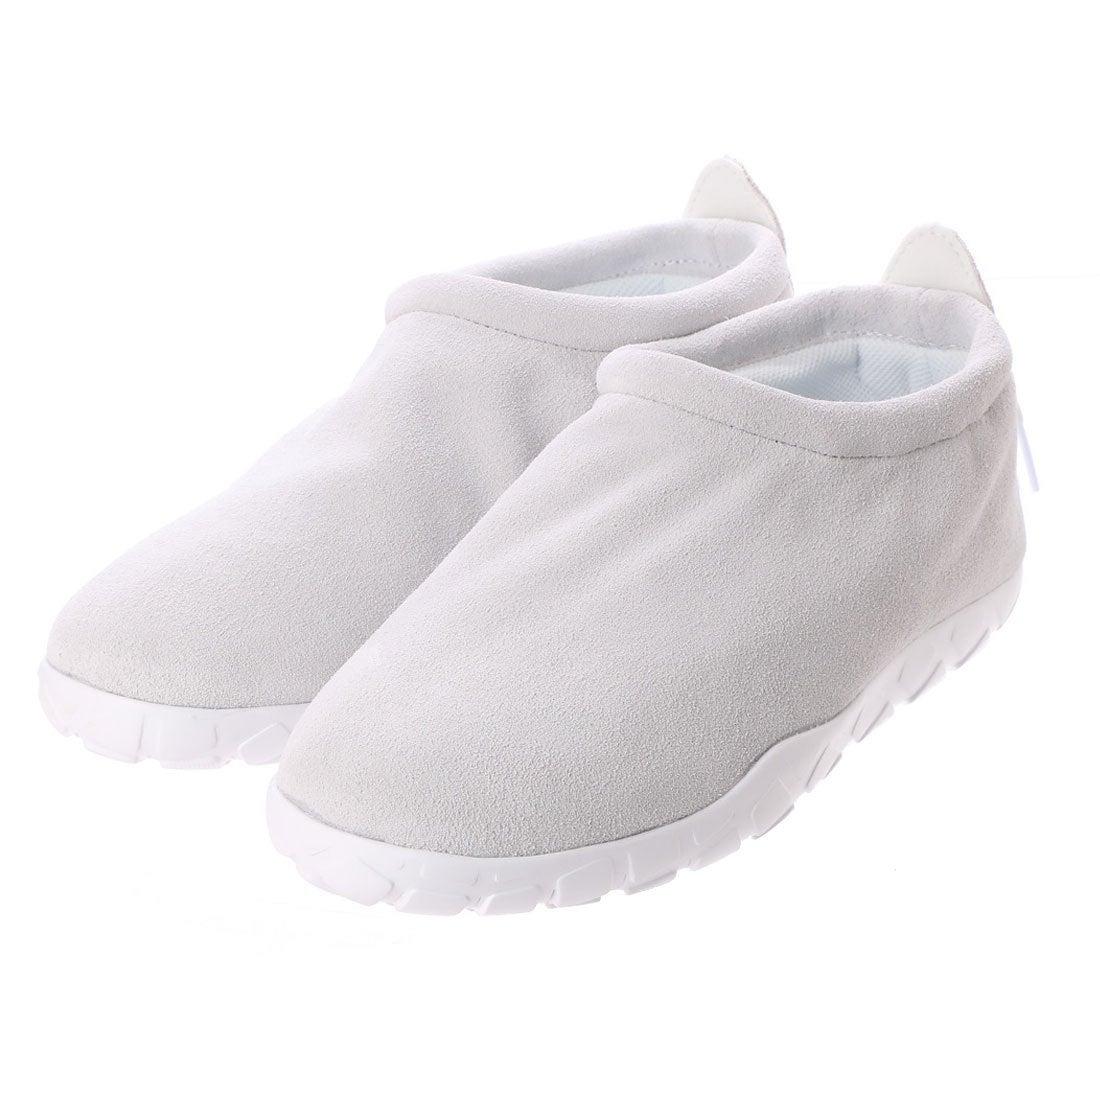 sneakers for cheap ea48a 4191e 商品画像. ¥10,692. ナイキ NIKE atmos AIR MOC ULTRA ...